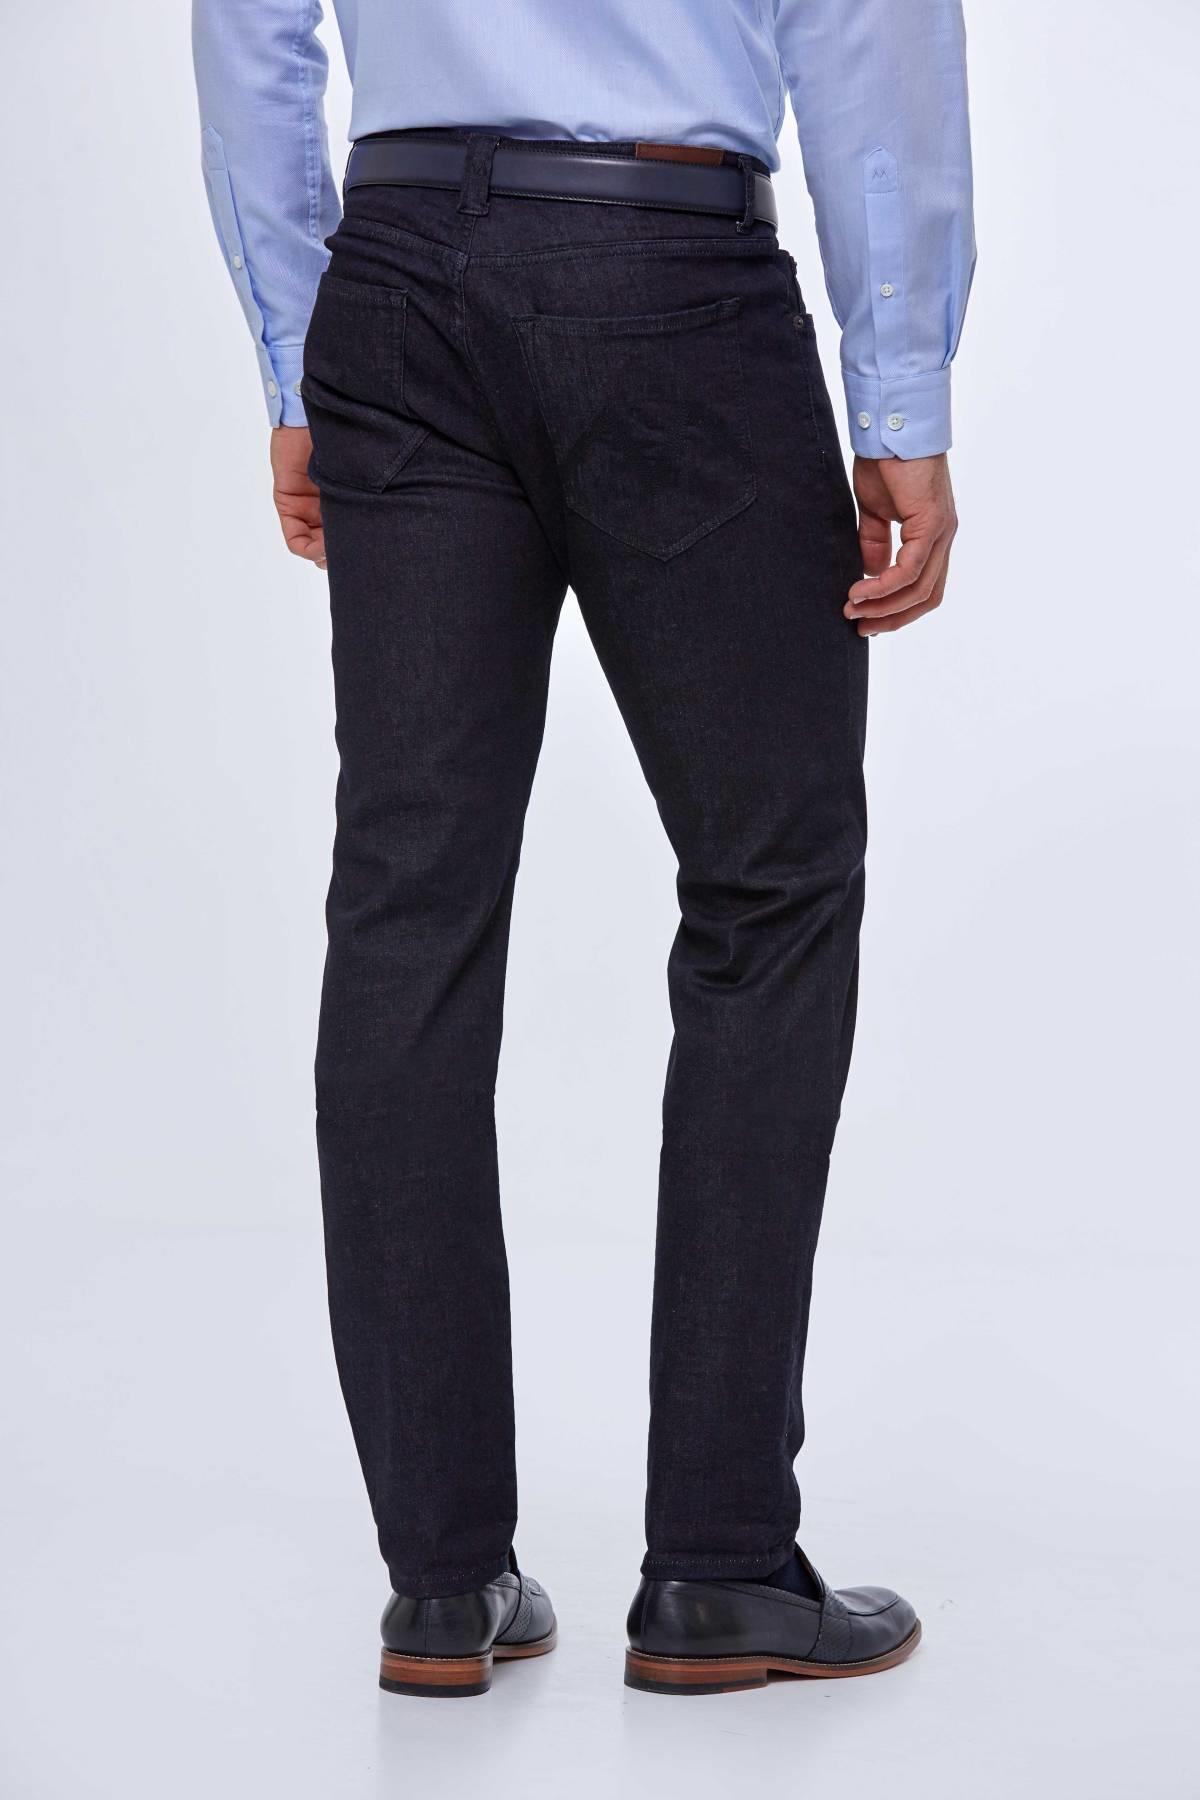 Slim Fit Koyu Renk Denim Pantolon